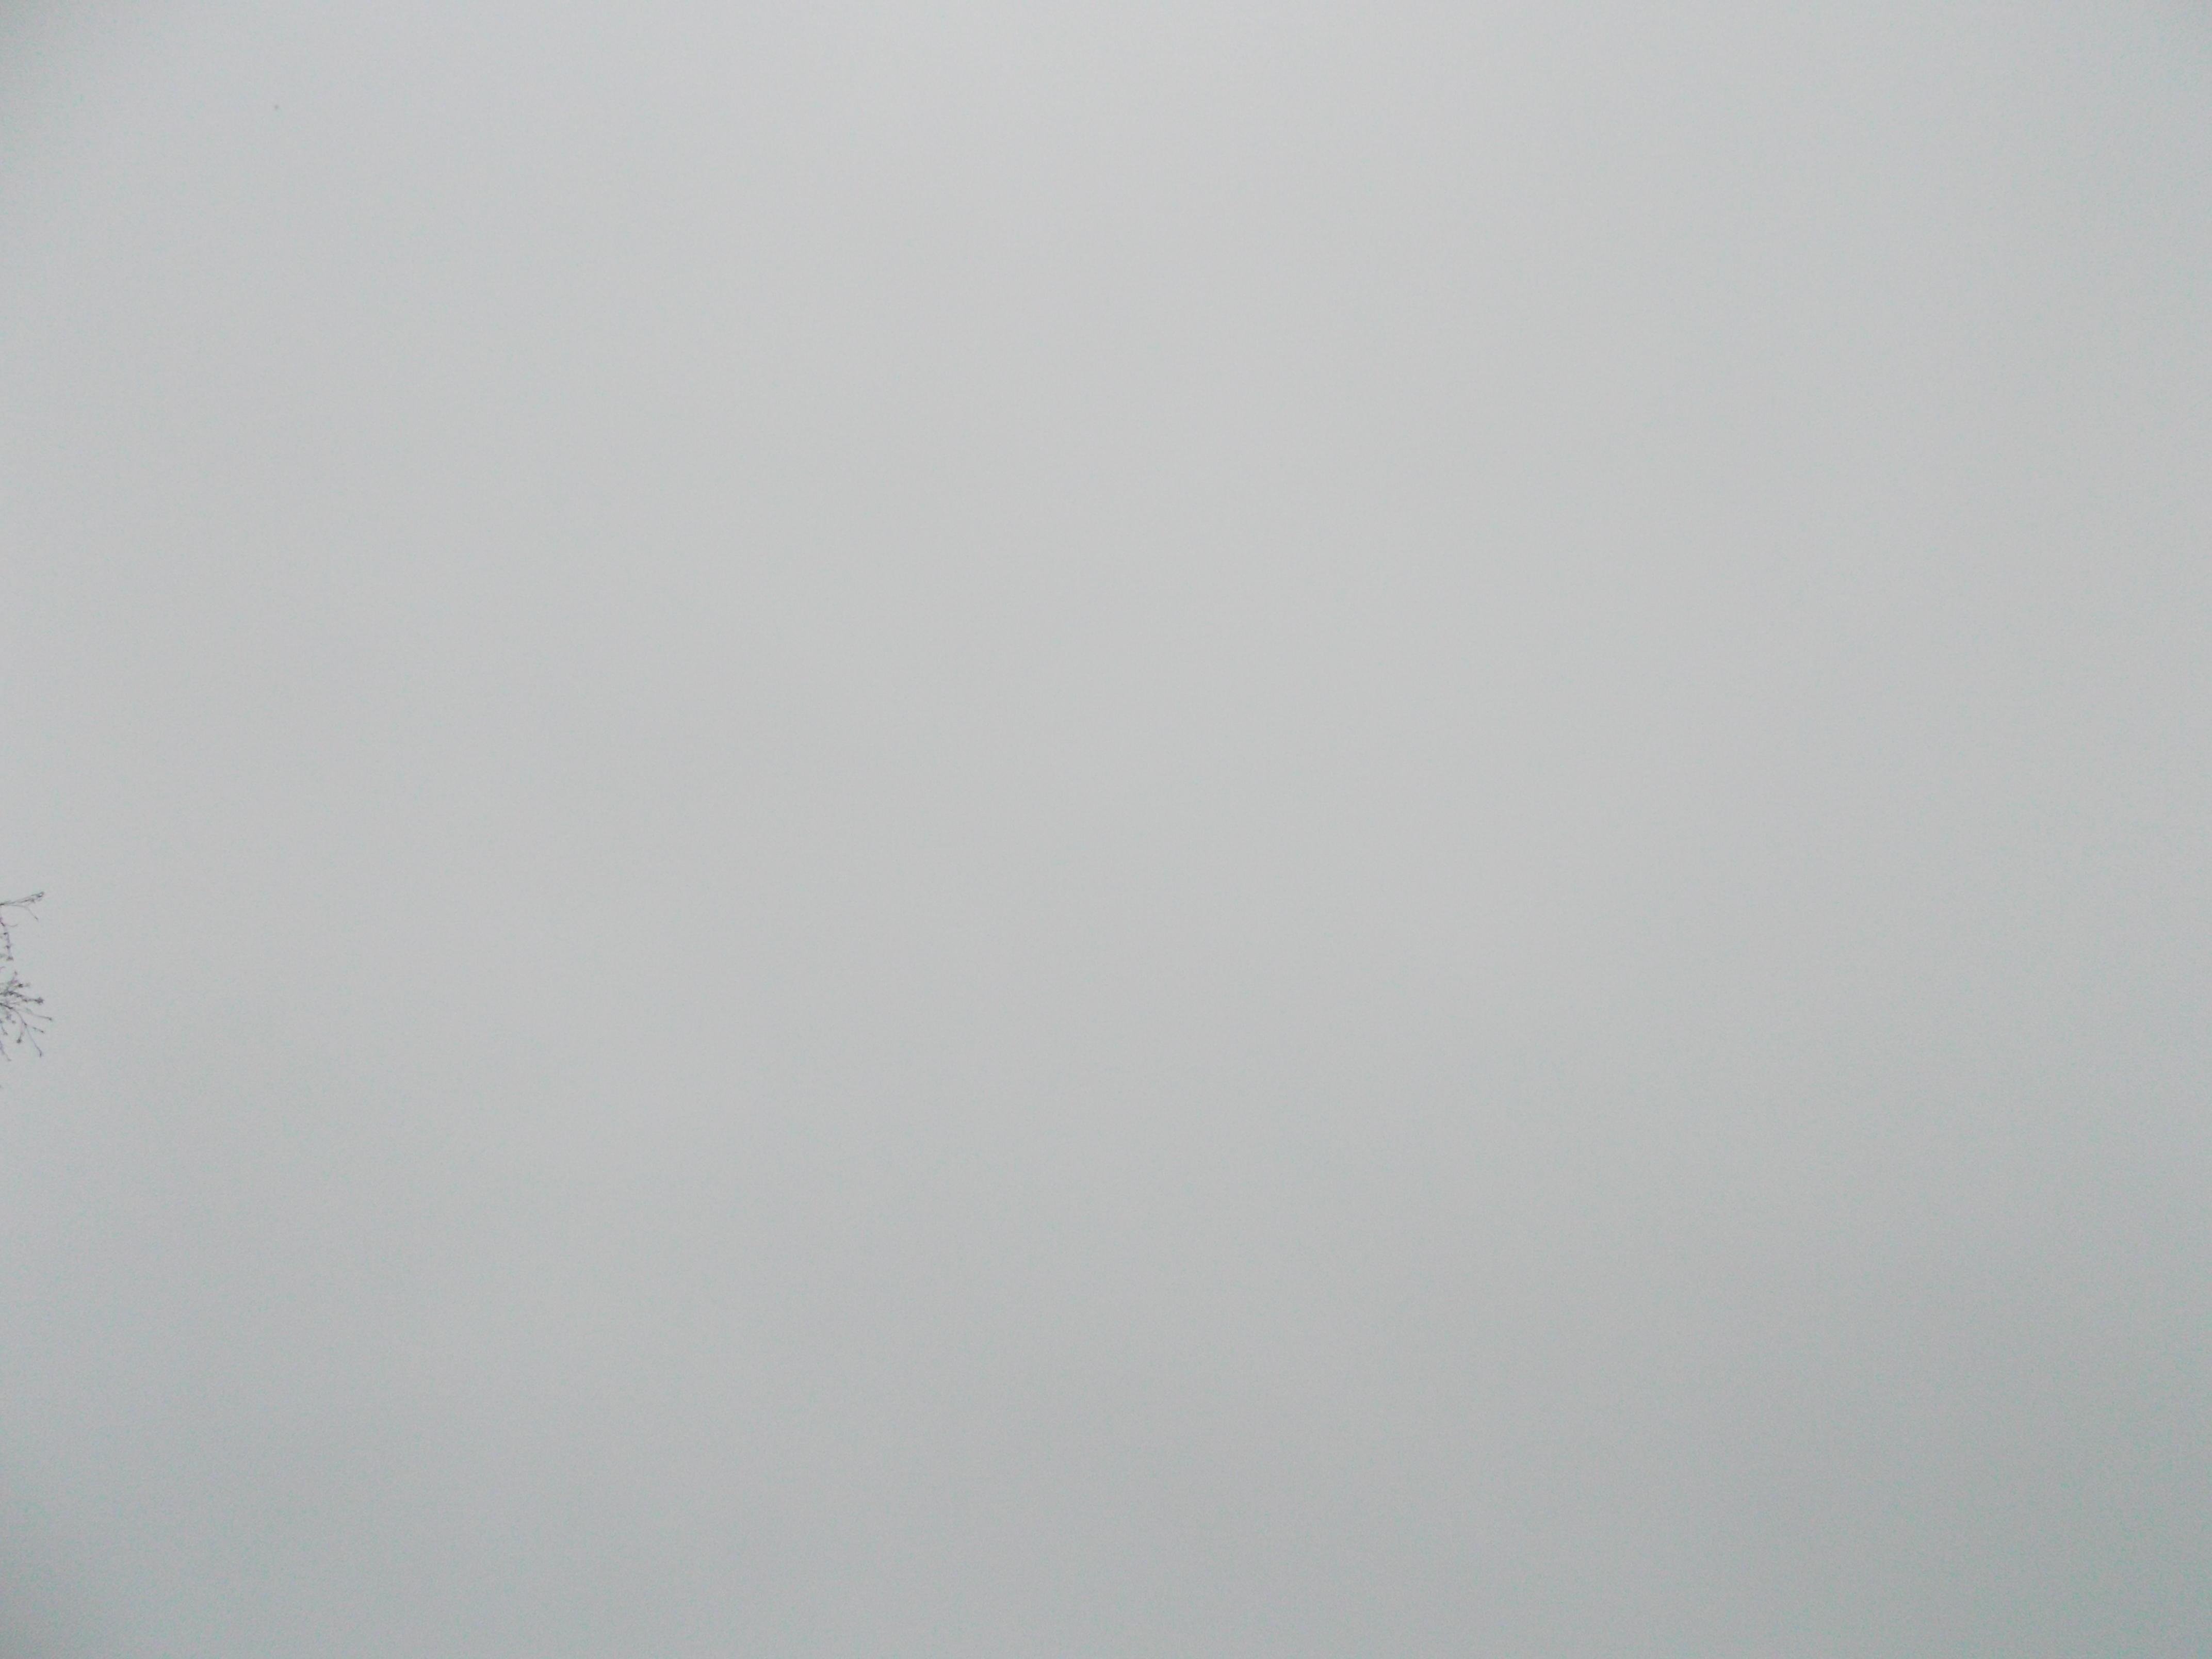 2013-01-02 Longitude -0.371 Latitude 49.182 Altitude 13 Heure 12h06